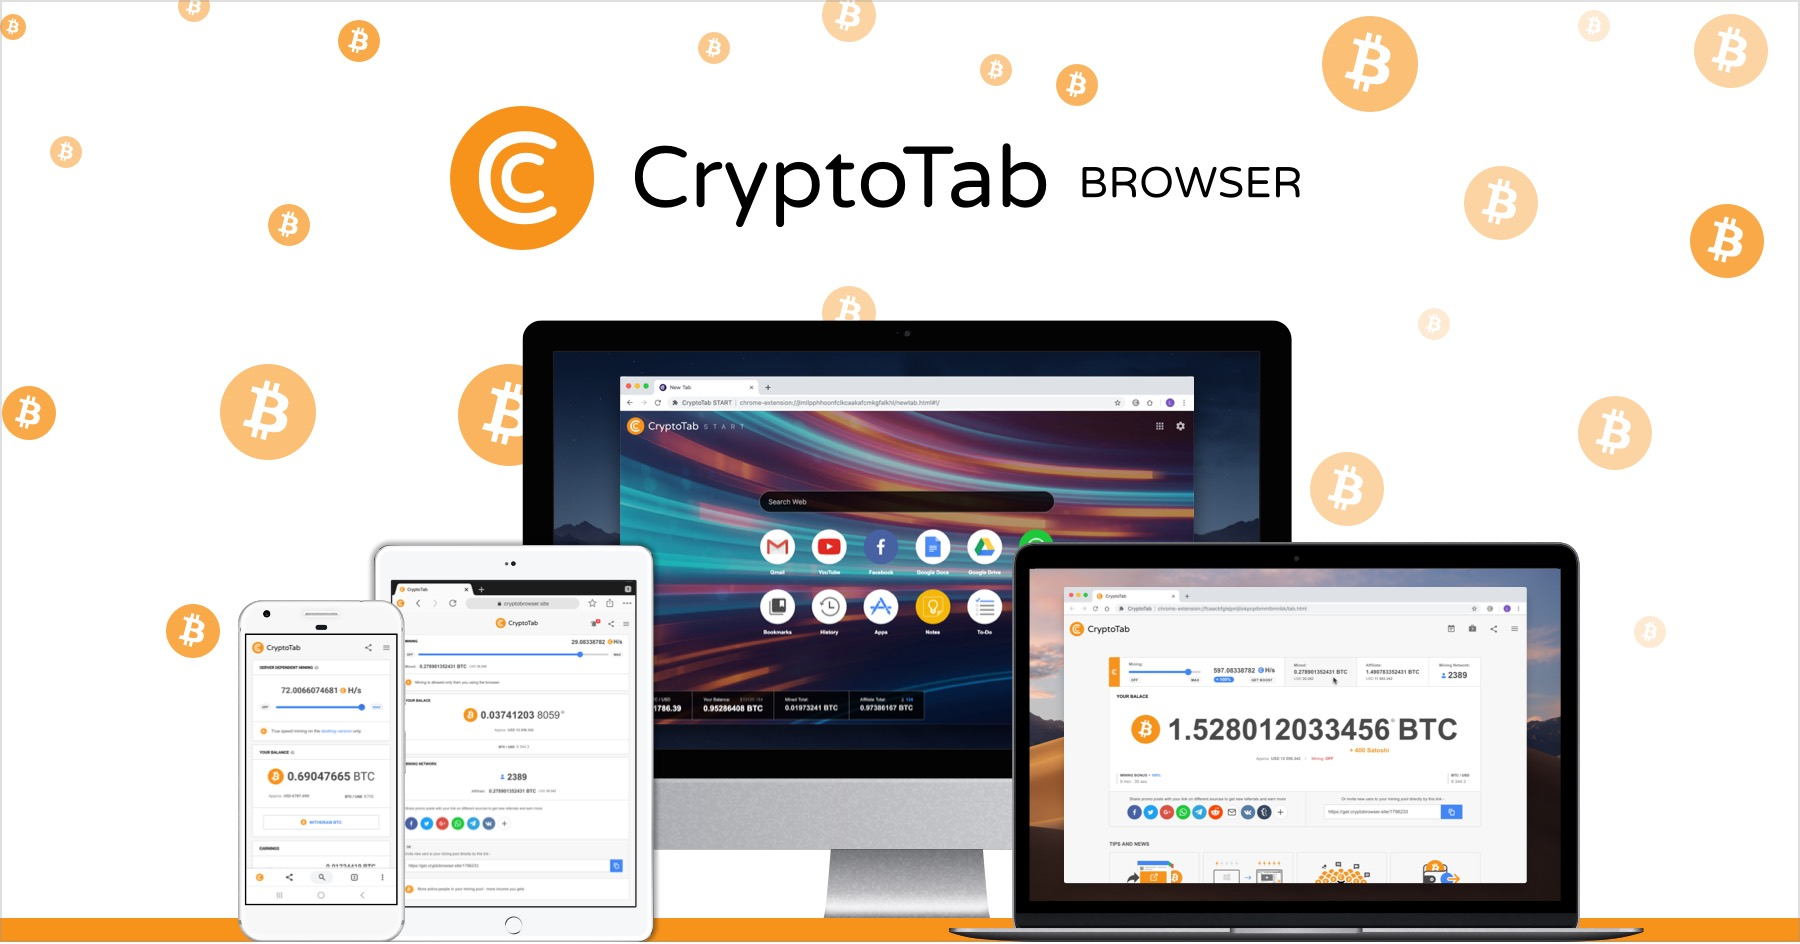 https://get.cryptobrowser.site/9923284